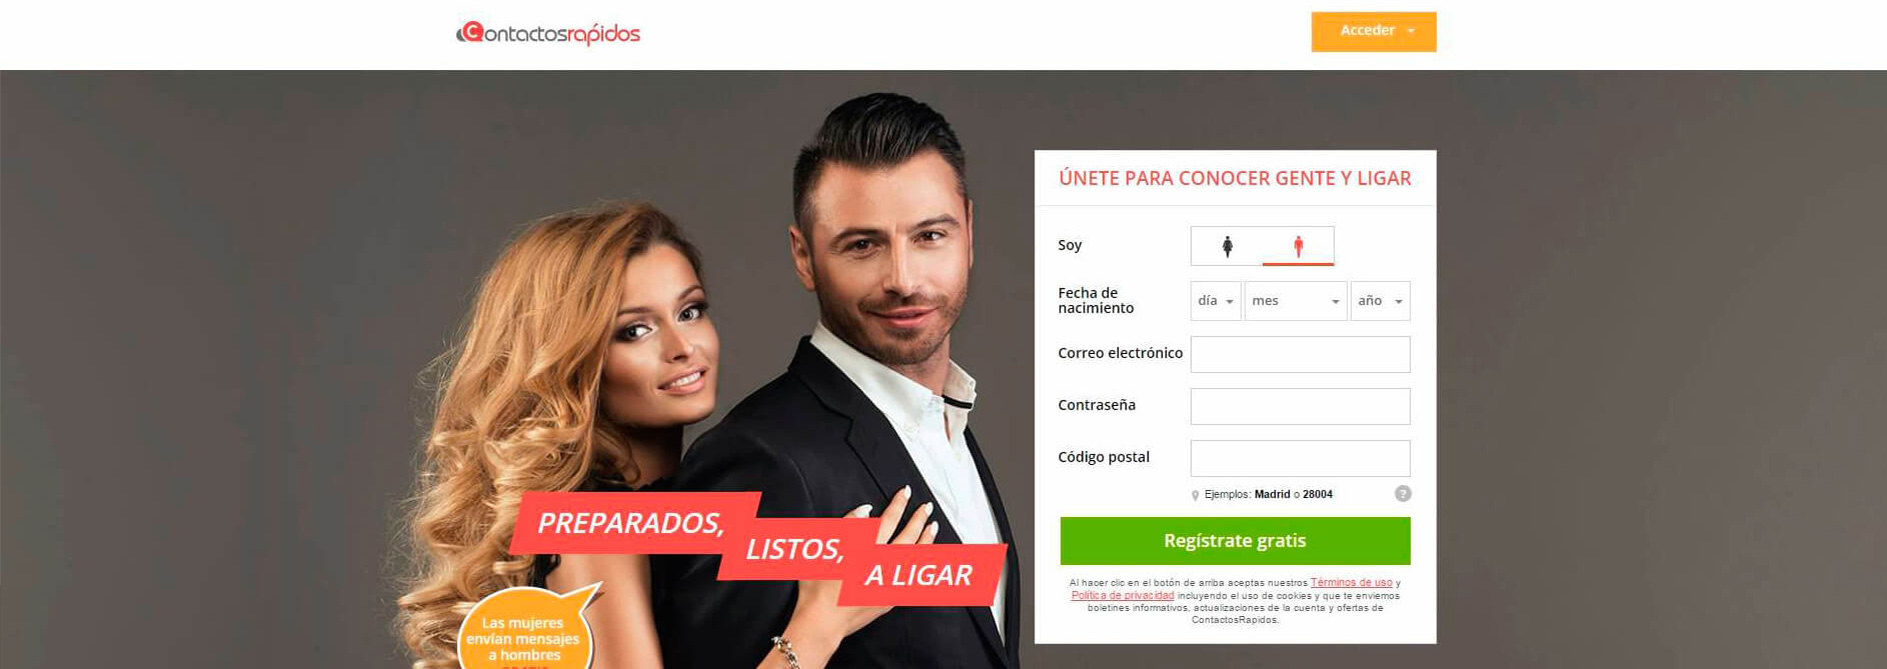 Paginas para conocer a hombres menina namoro Póvoa-7440